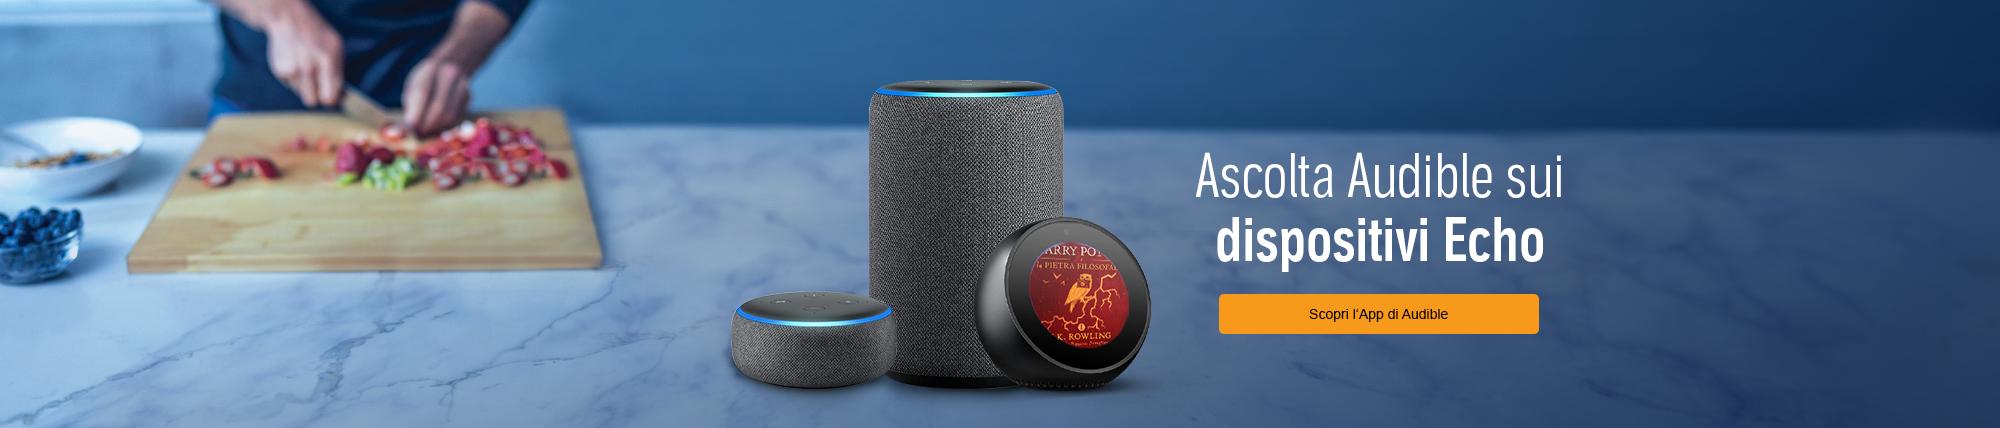 Ascolta Audible sui dispositivi Echo.